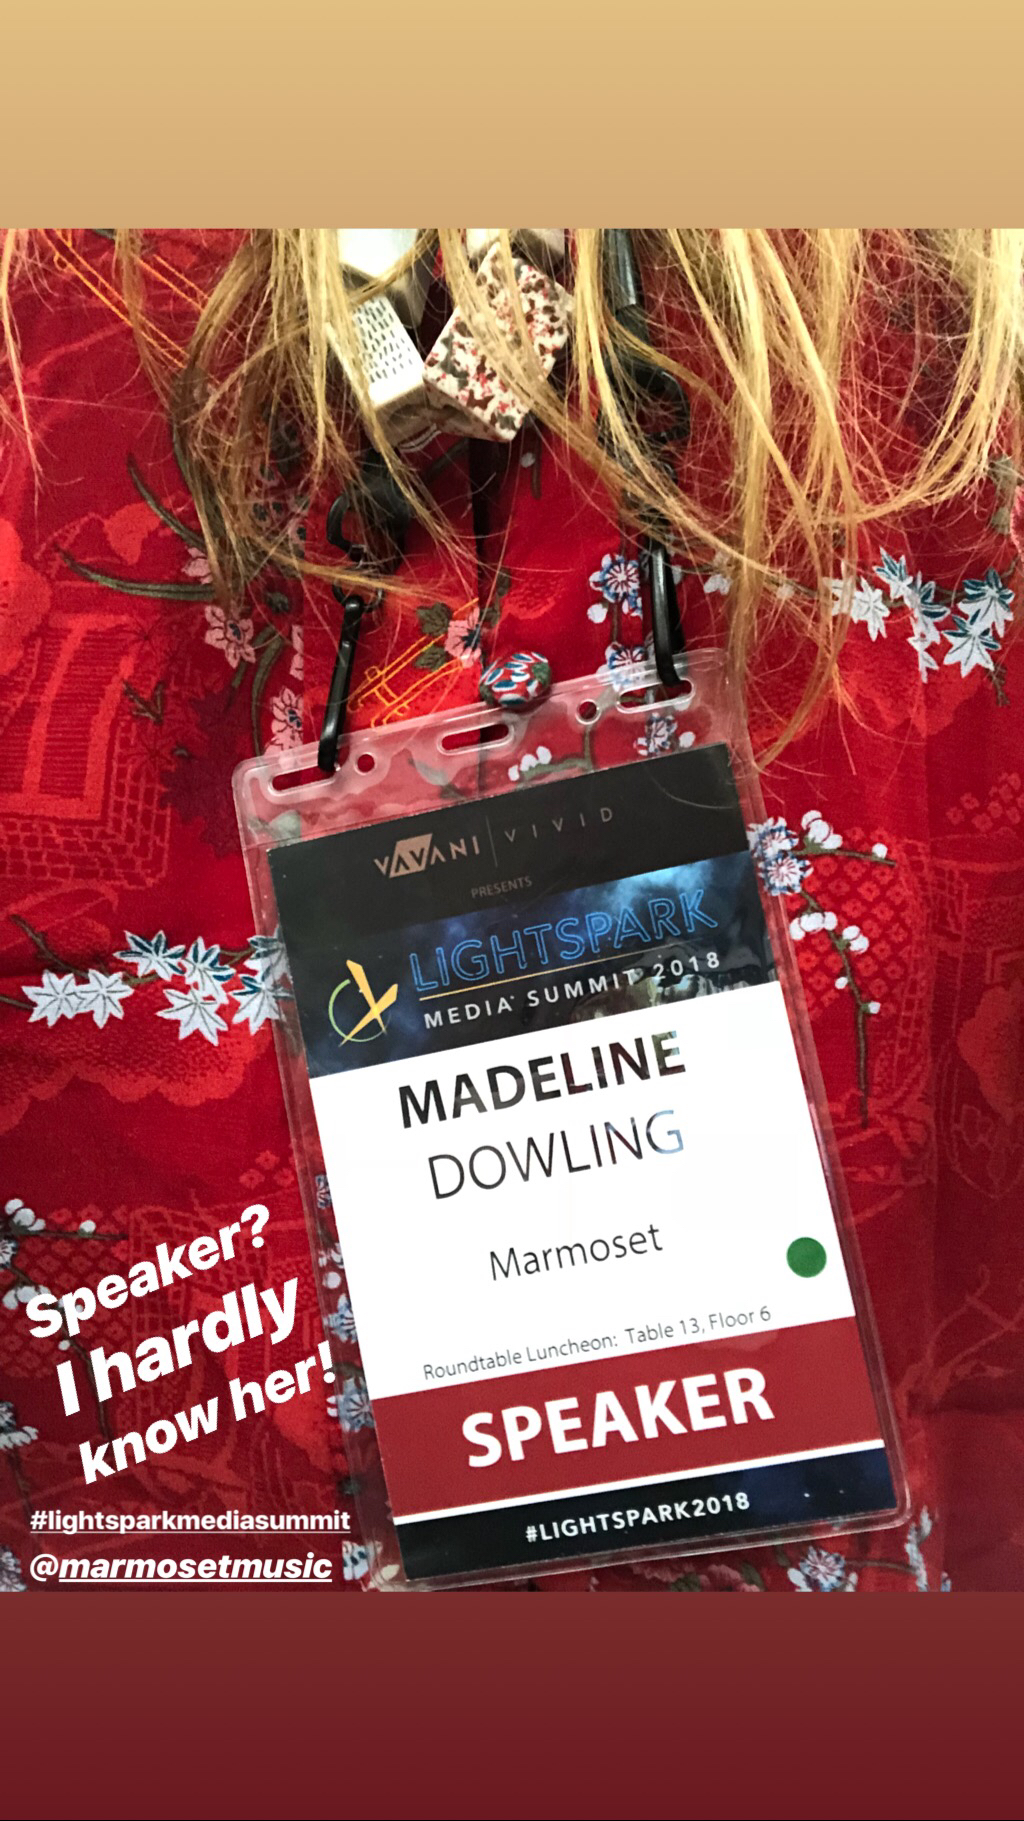 Madeline Dowling Marmoset Lightspark